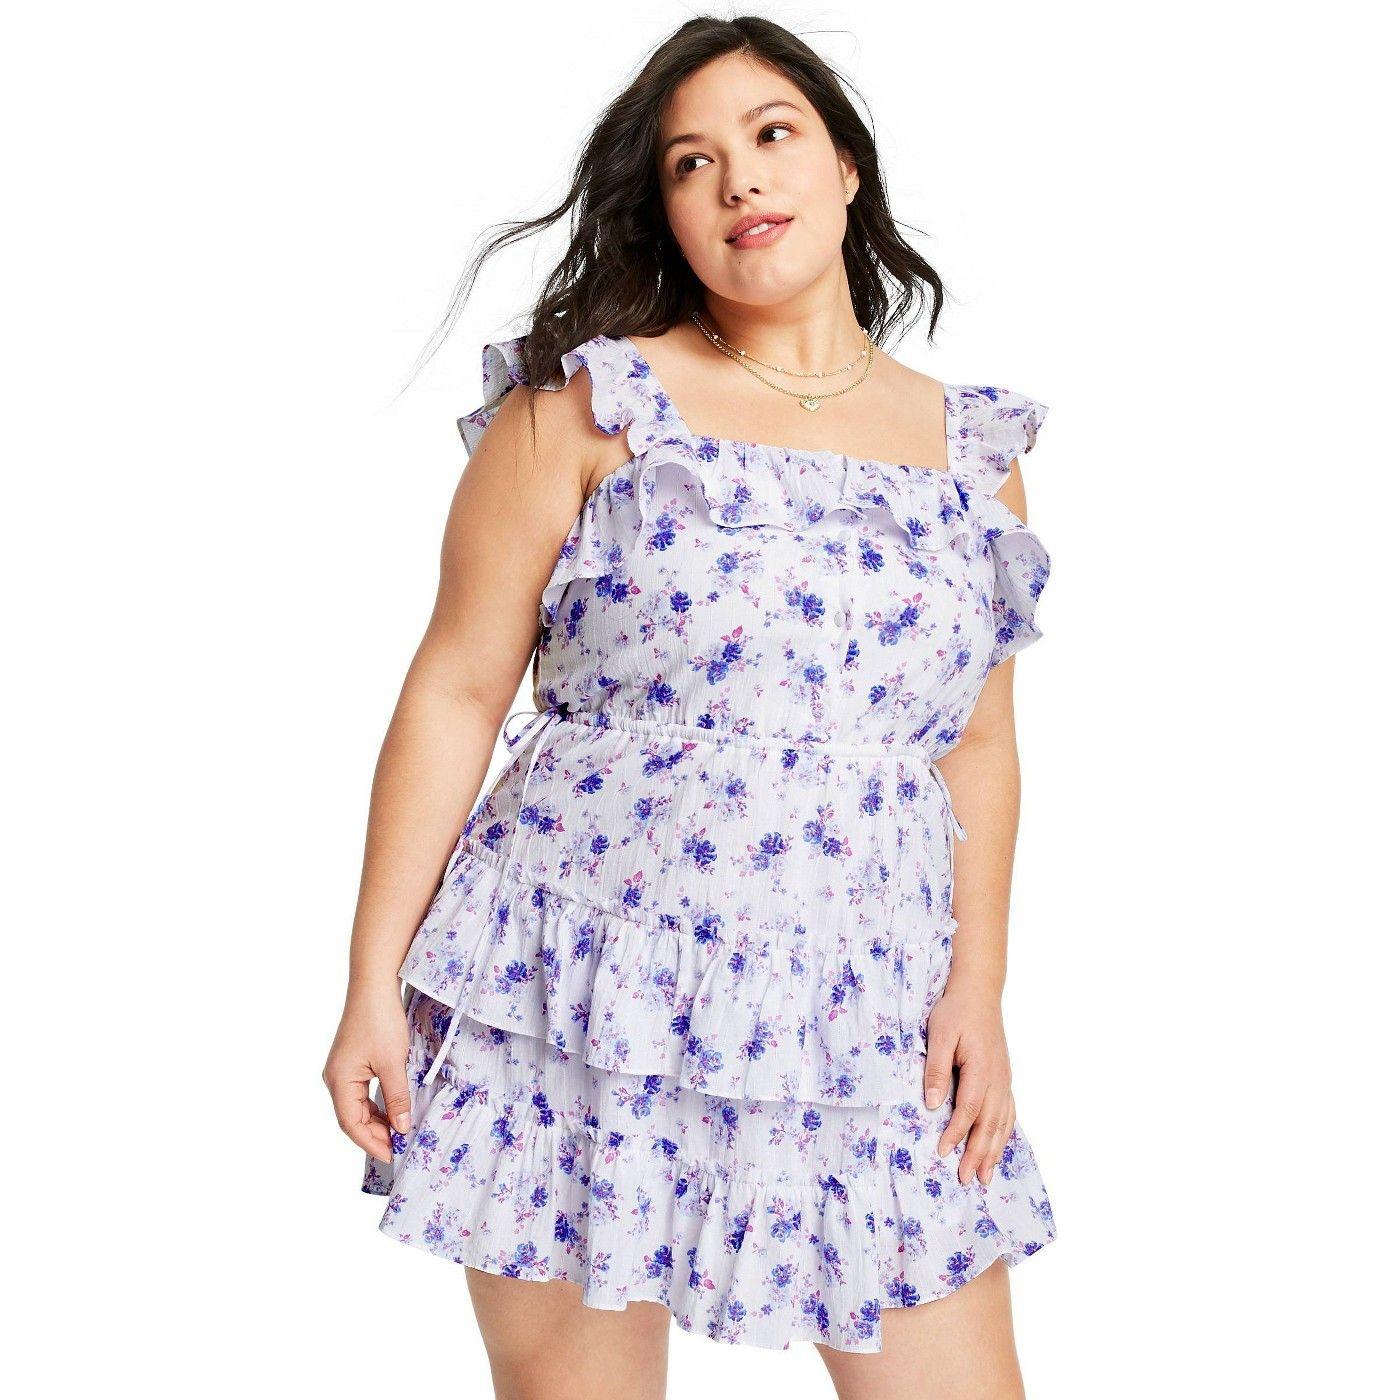 Women S Amalie Tiered Ruffle Dress Loveshackfancy For Target Regular Plus White Blue Sponsored Ruffle Ad D Tiered Ruffle Dress Ruffle Dress Dresses [ 1400 x 1400 Pixel ]